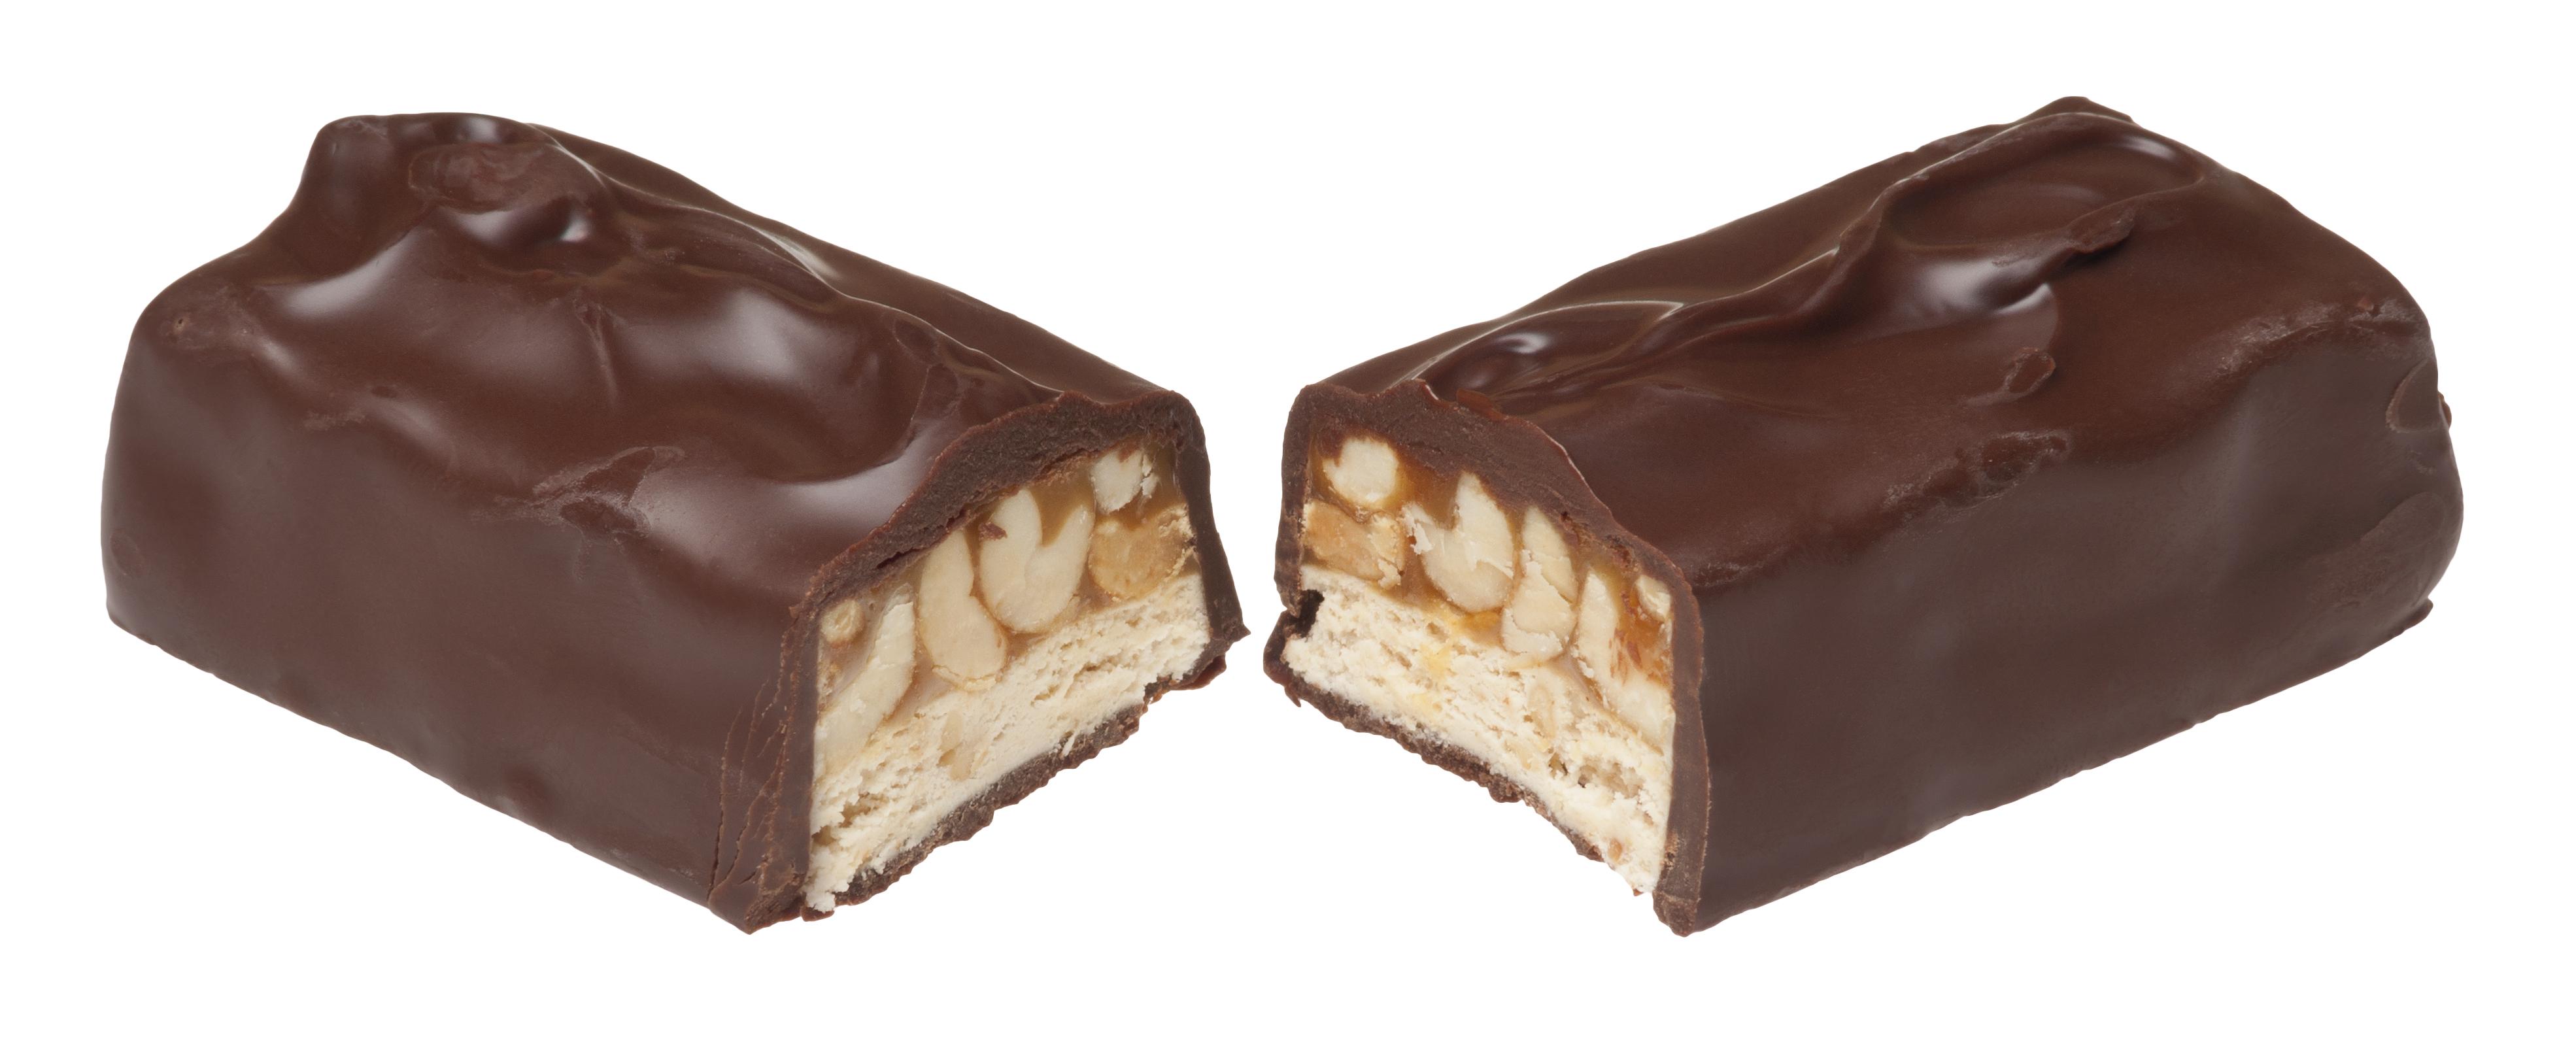 loading image for Chocolate bars